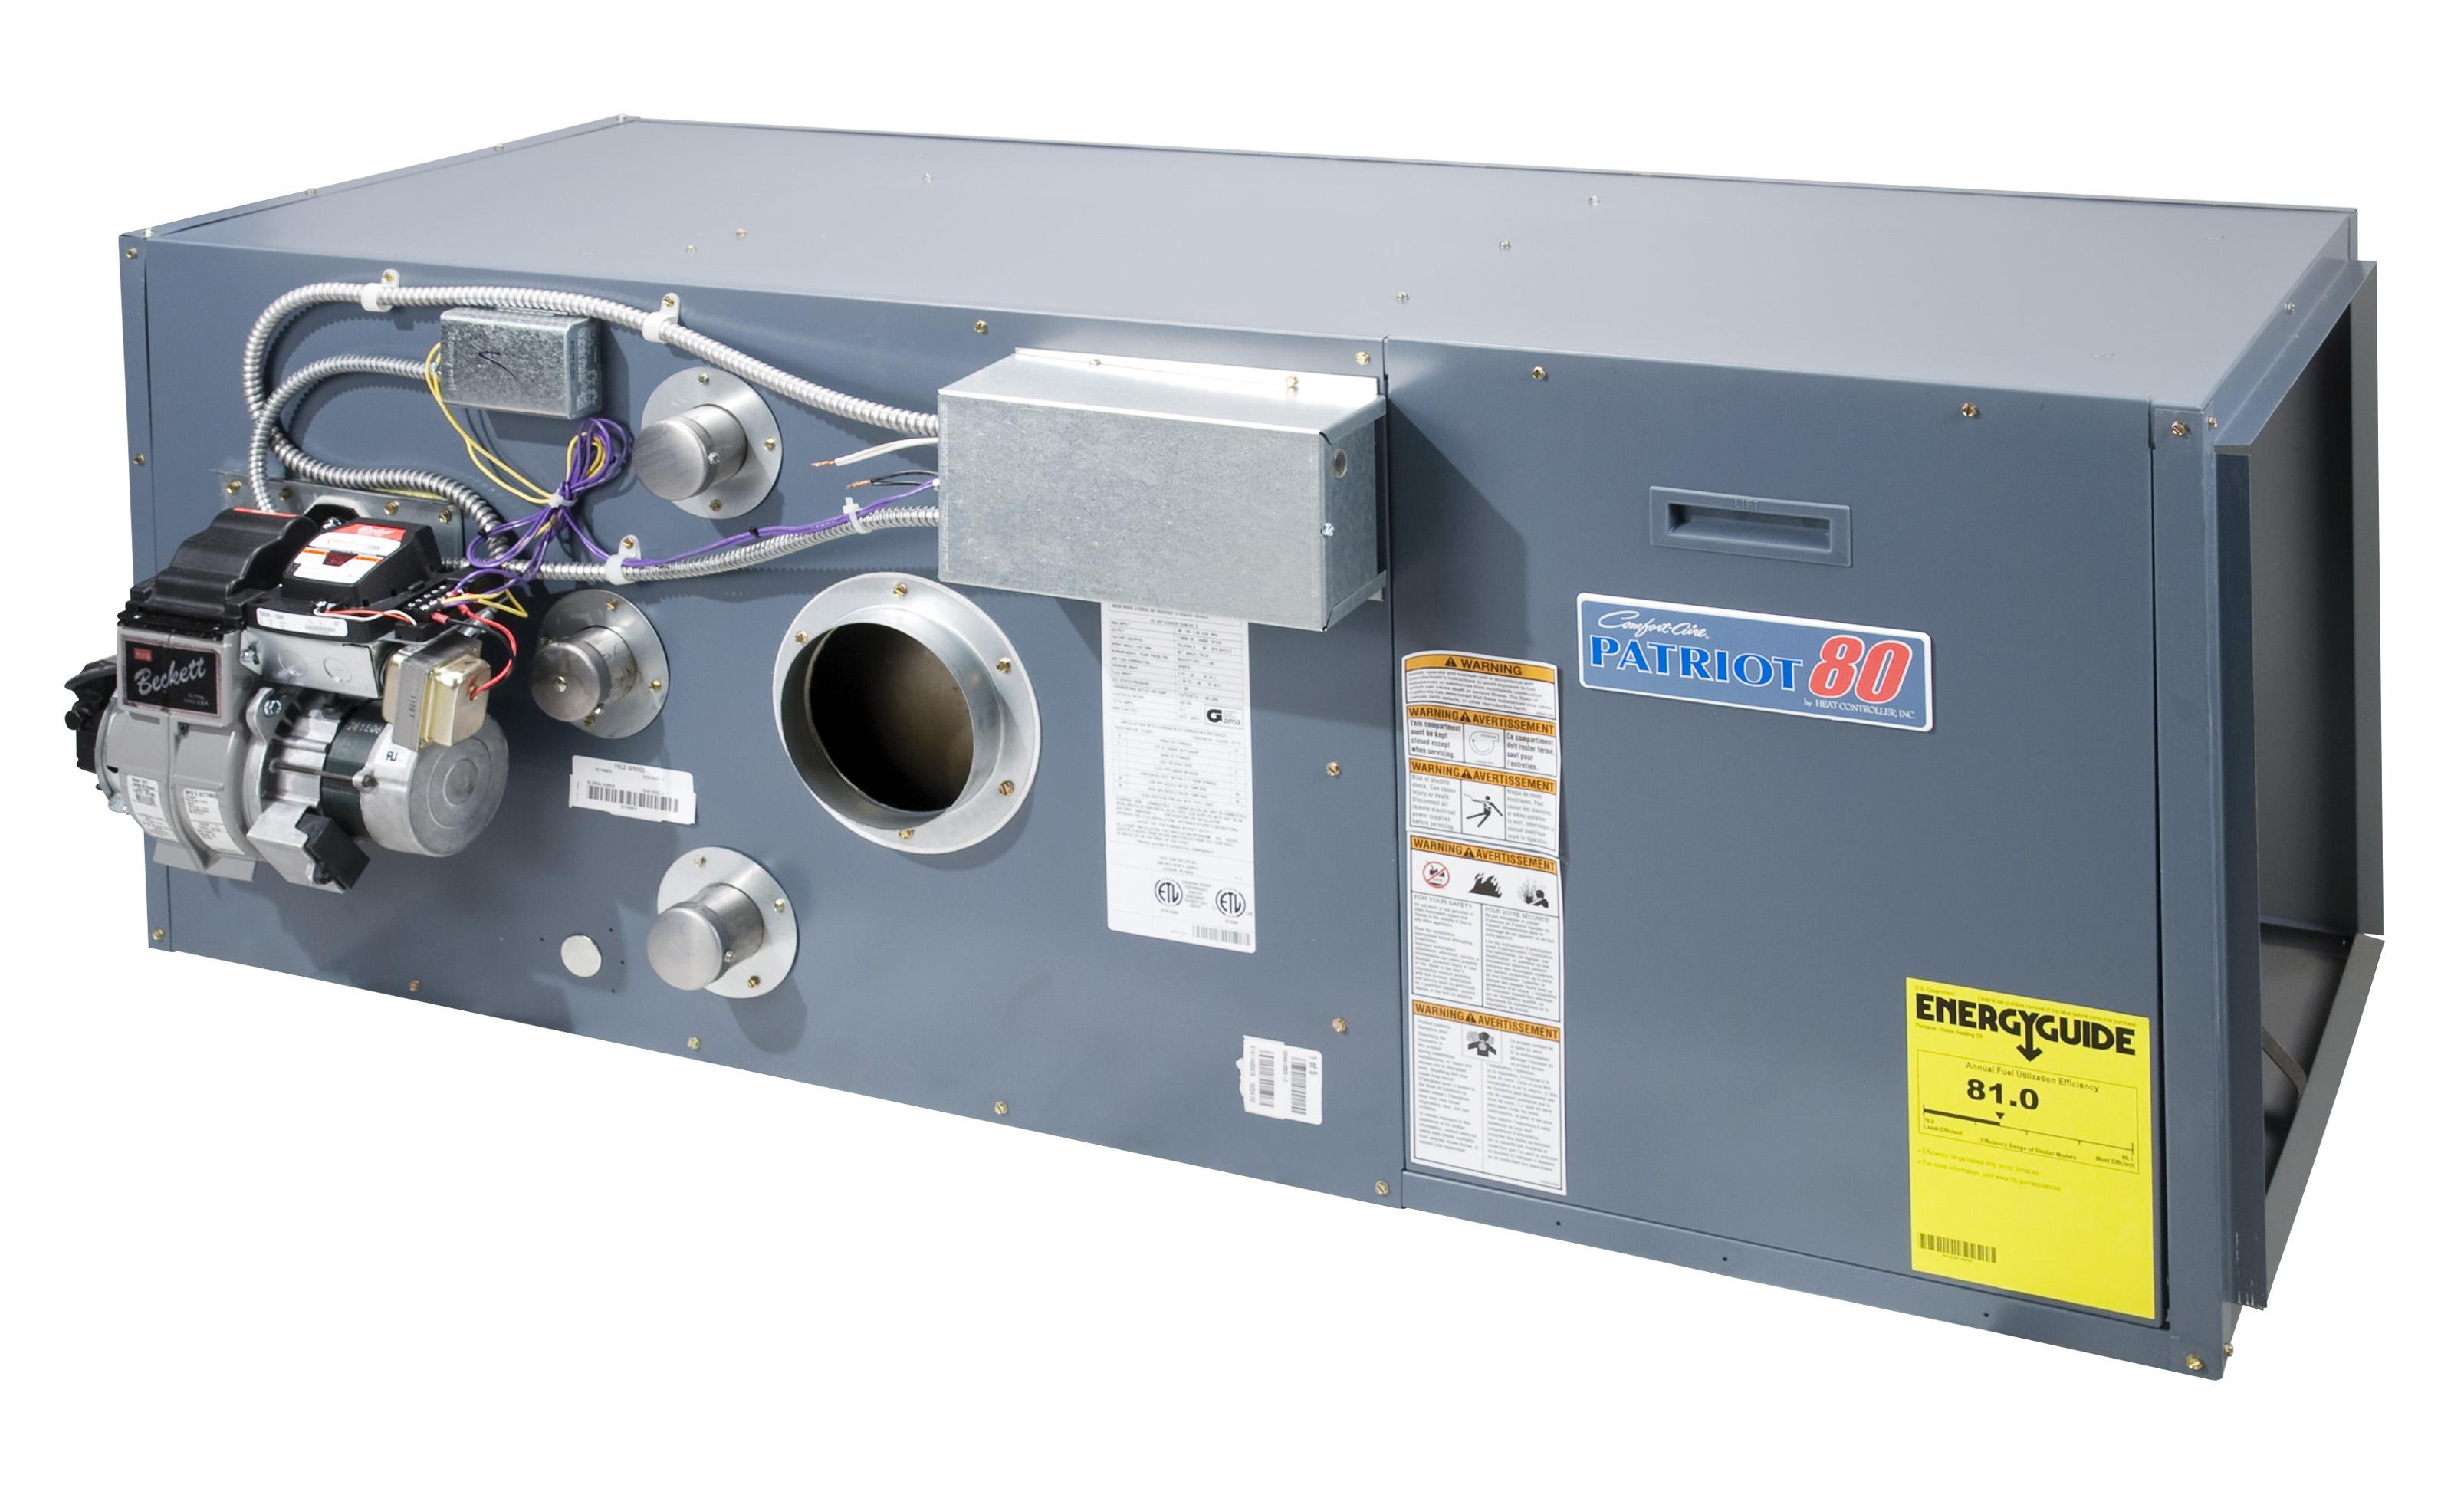 Comfort Aire 101,000-113,500 BTU ODRB95-D3-3A Oil Furnace